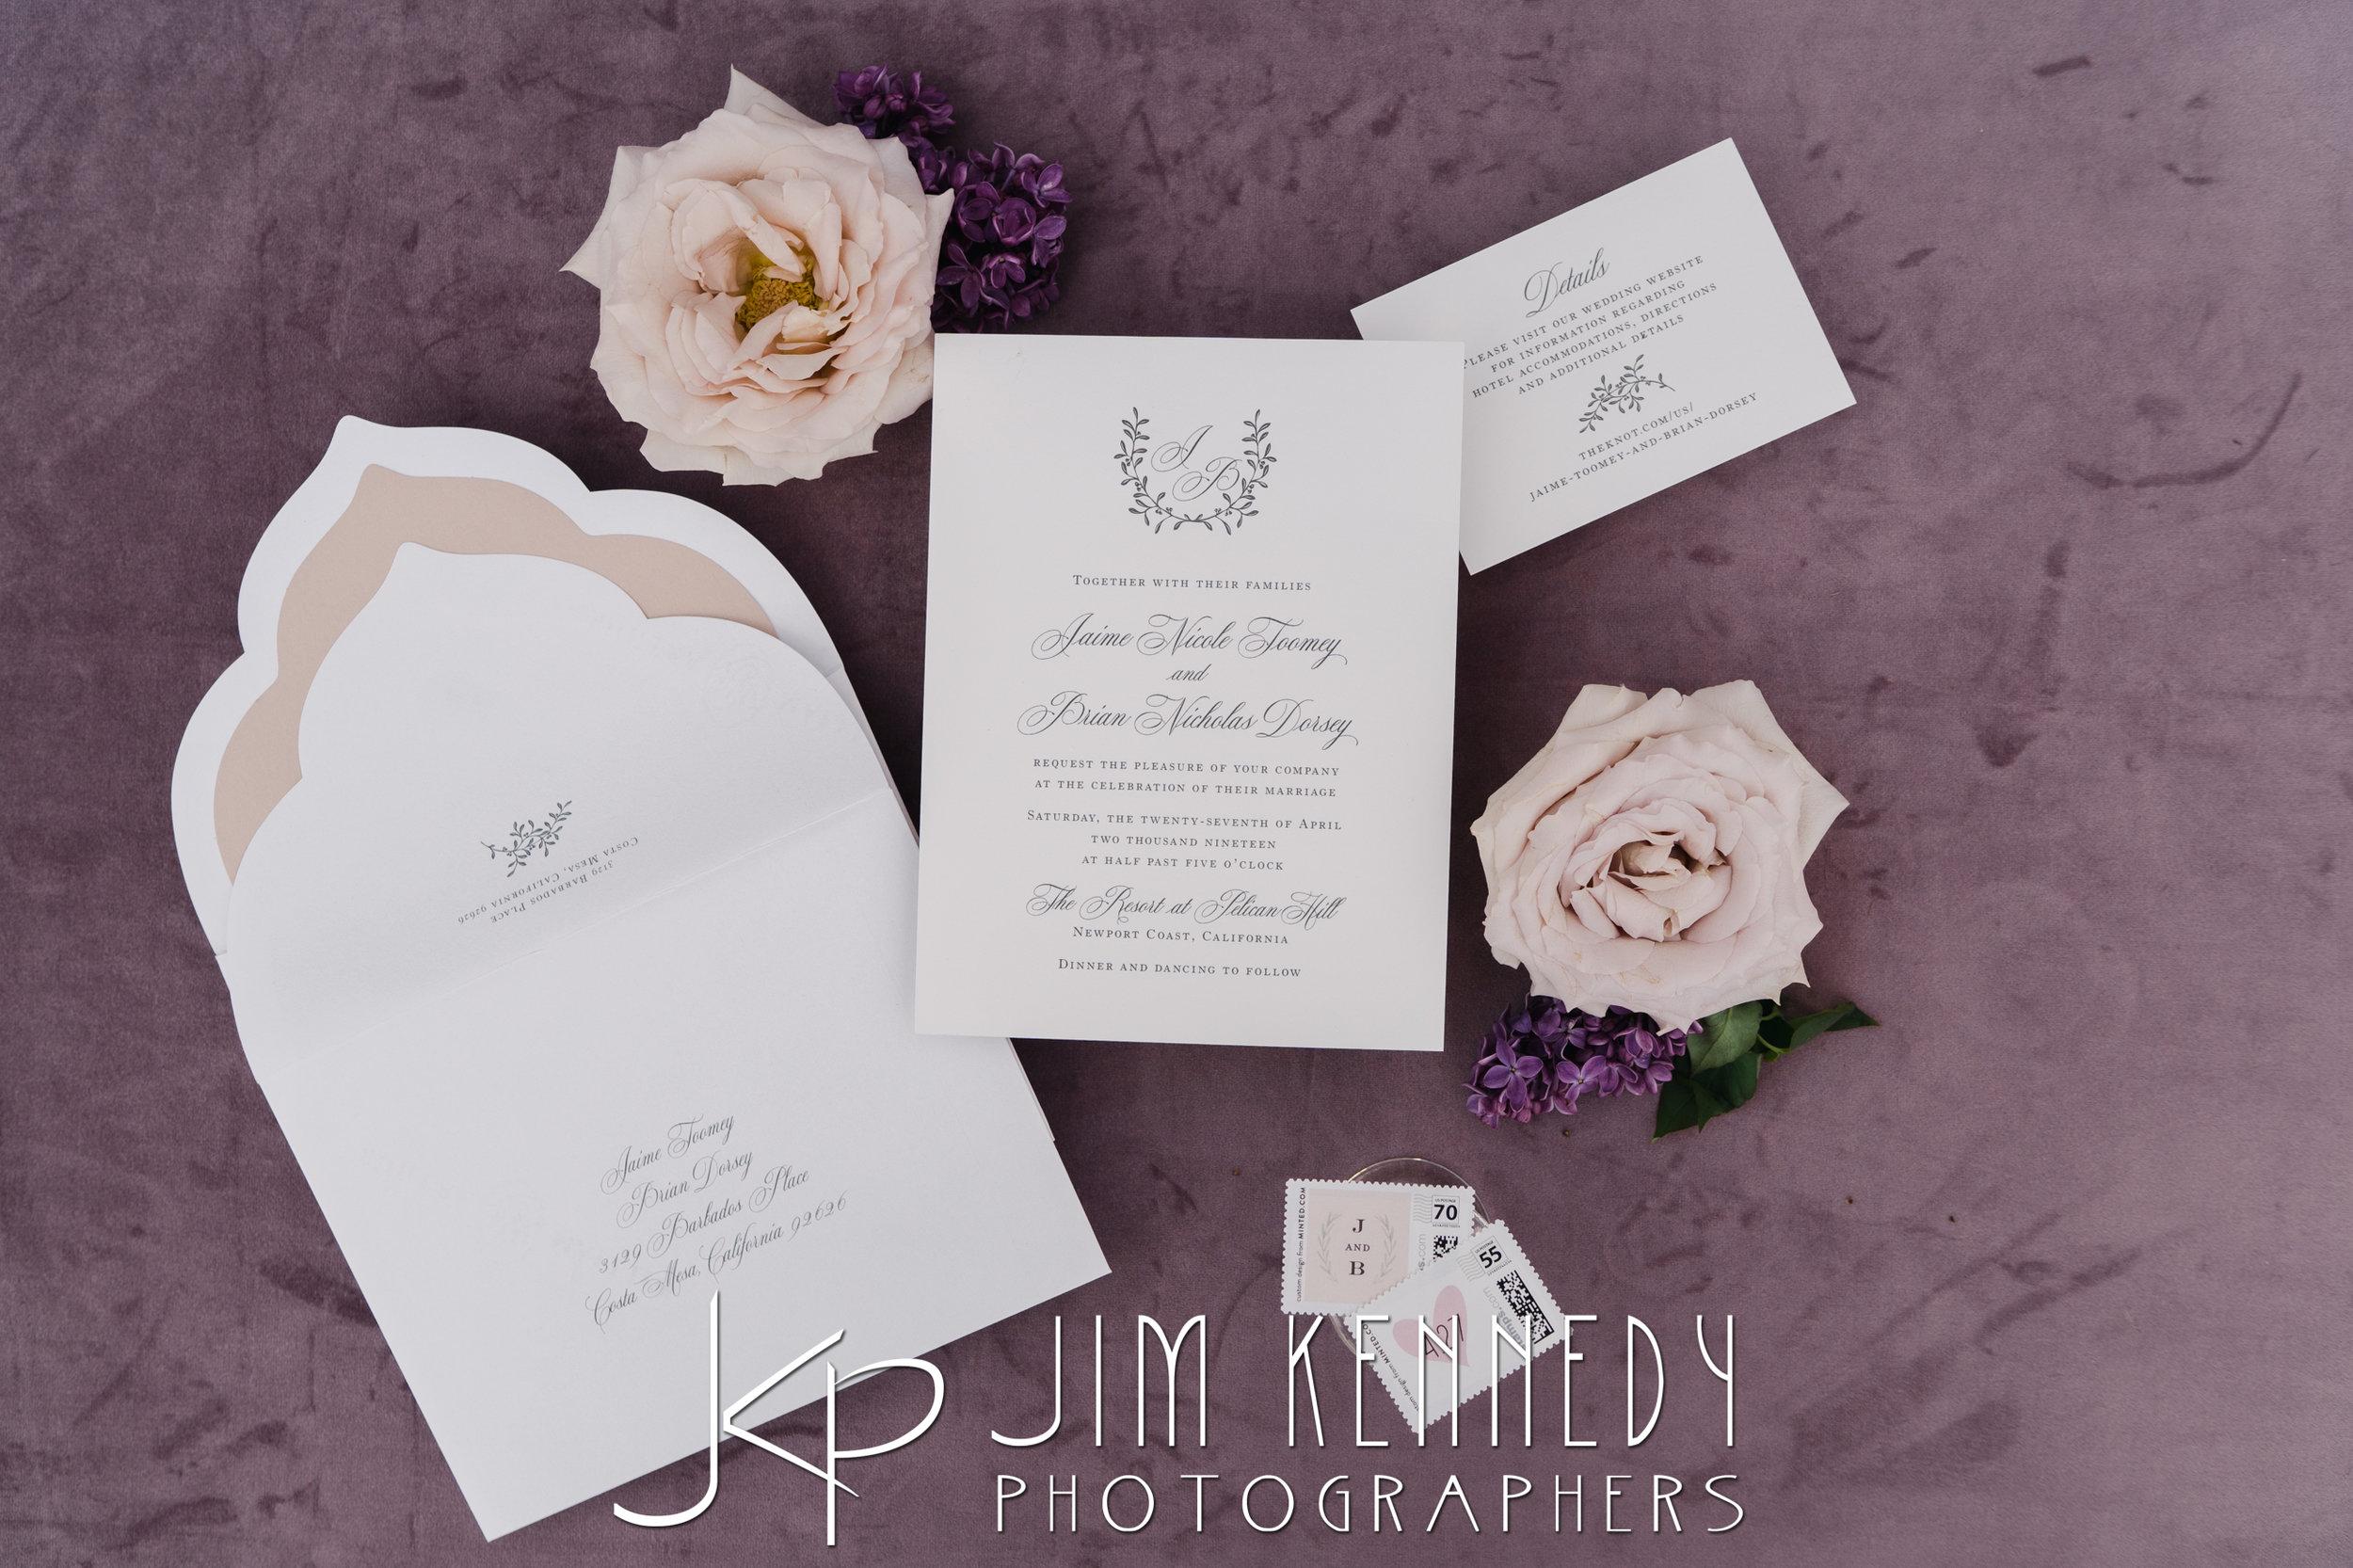 pelican-hill-wedding-jim-kenedy-photographers_0001.JPG